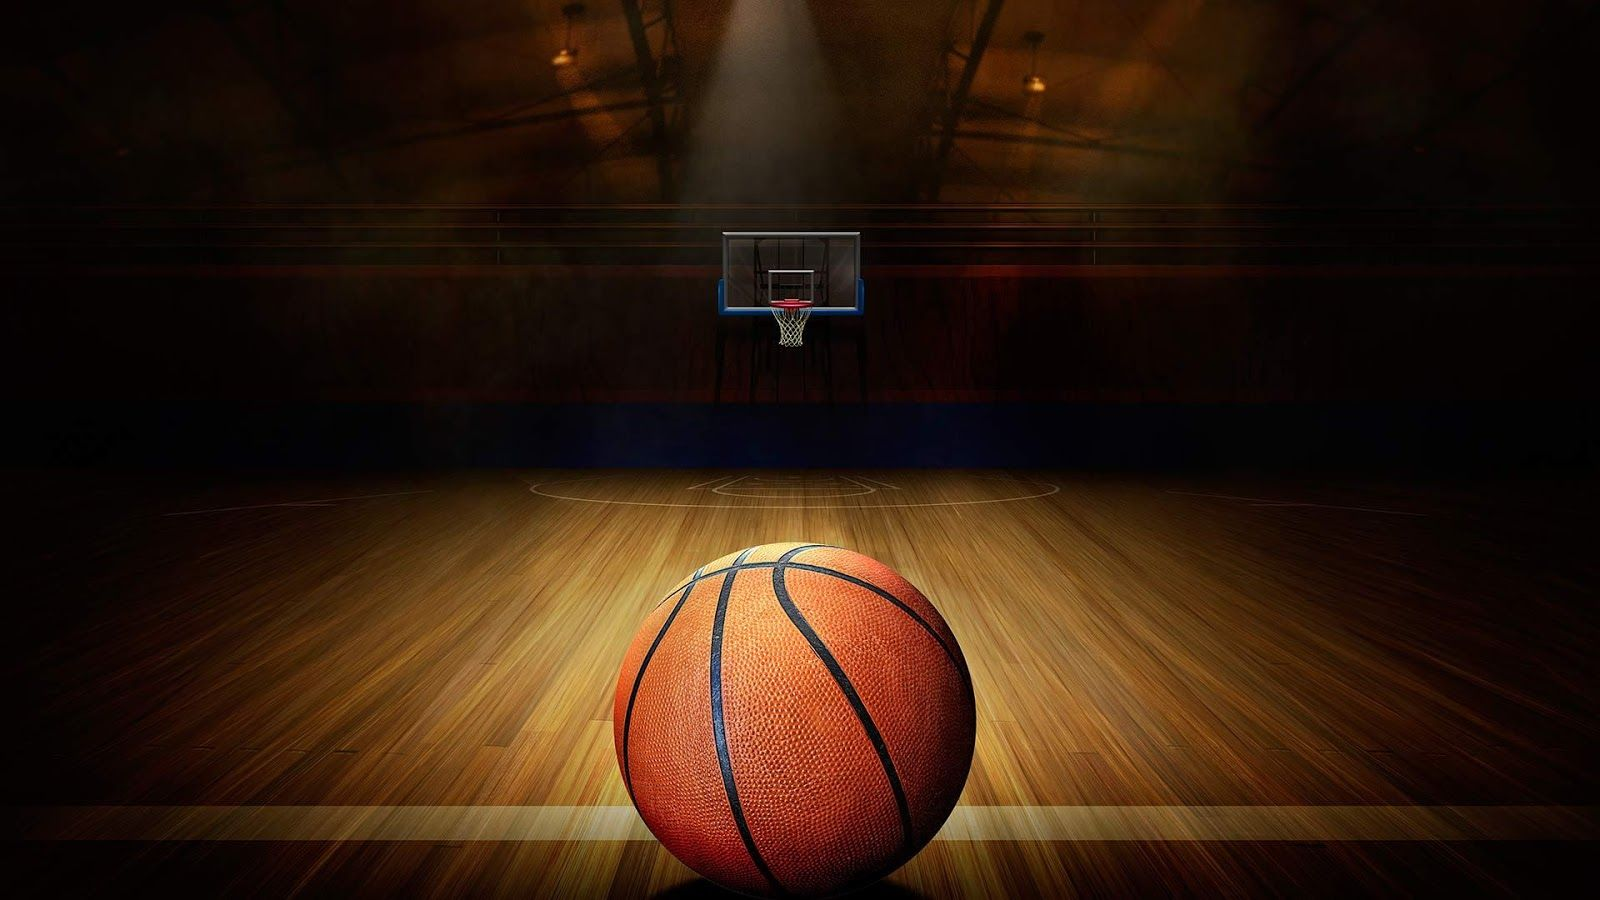 Basketball never stops! My life Basketball background